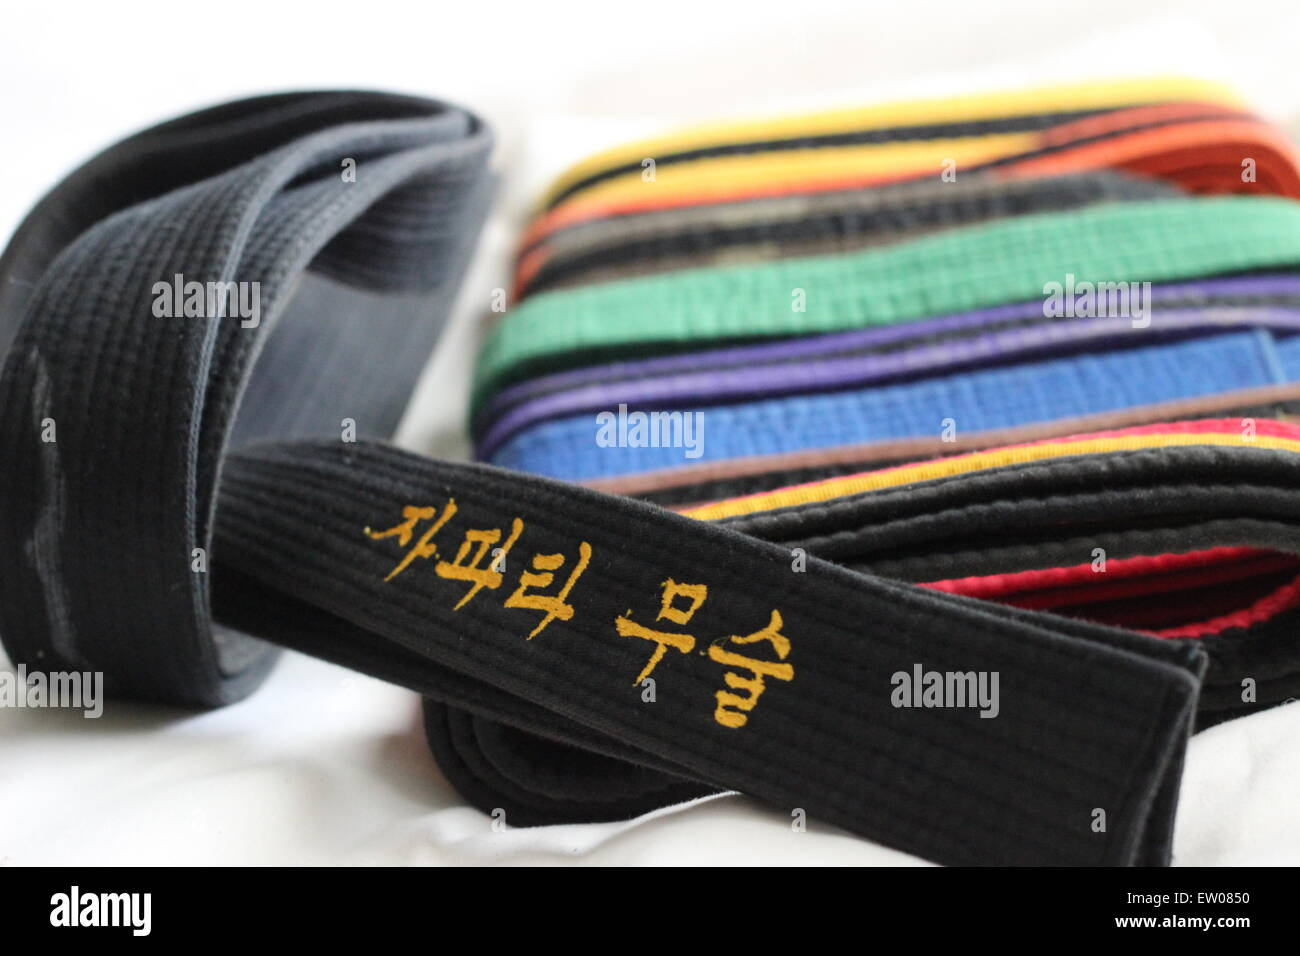 A pile of taekwondo belts. - Stock Image